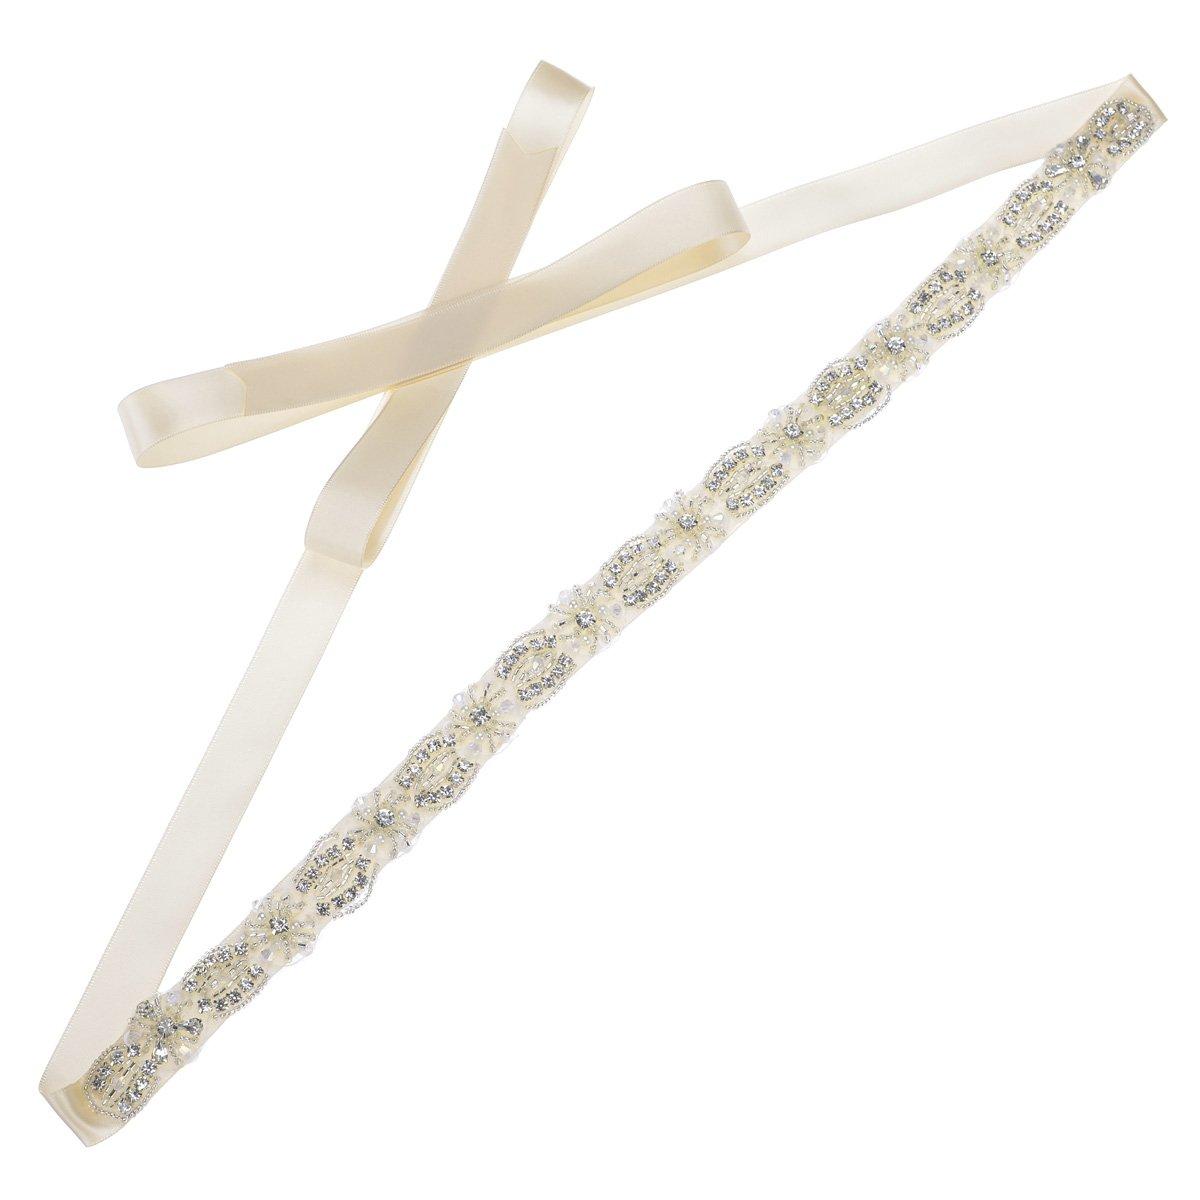 Remedios Elegant and Stylish Pearl Rhinestone Embellishments Bridal Belt Sash,Champagne